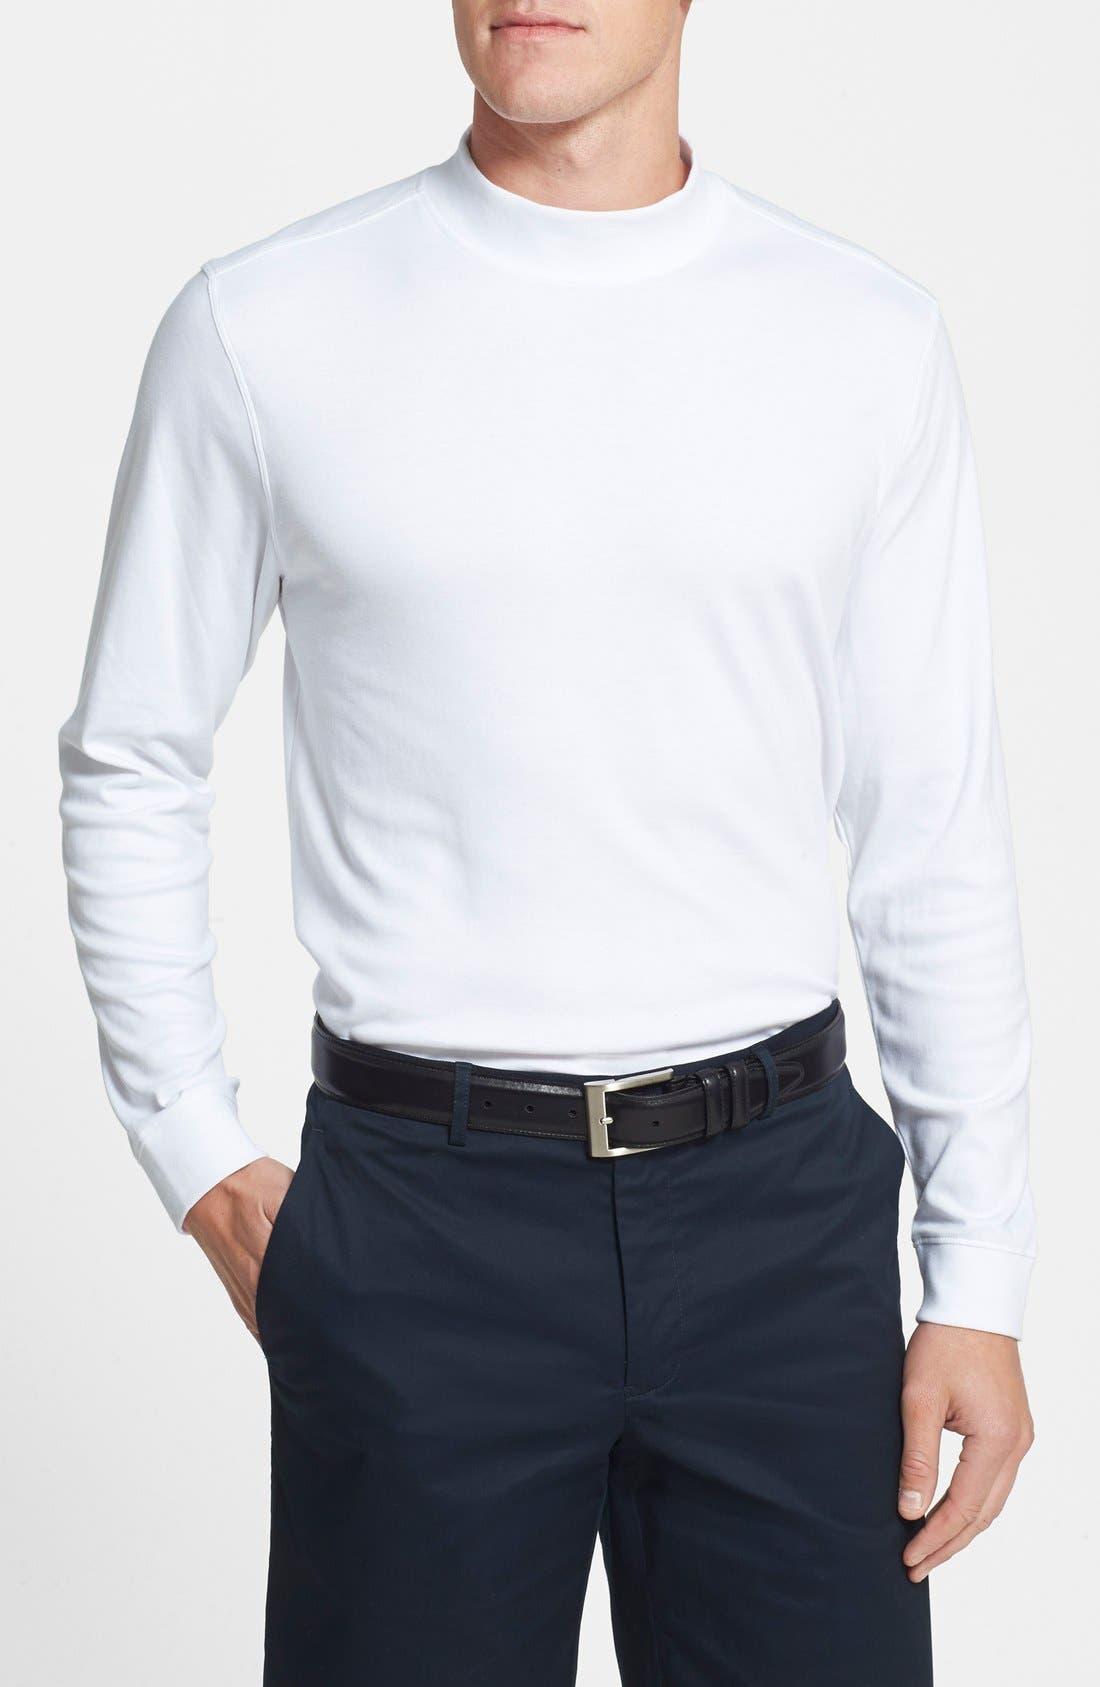 'Belfair' Long Sleeve Mock Neck Pima Cotton T-Shirt,                             Main thumbnail 1, color,                             White